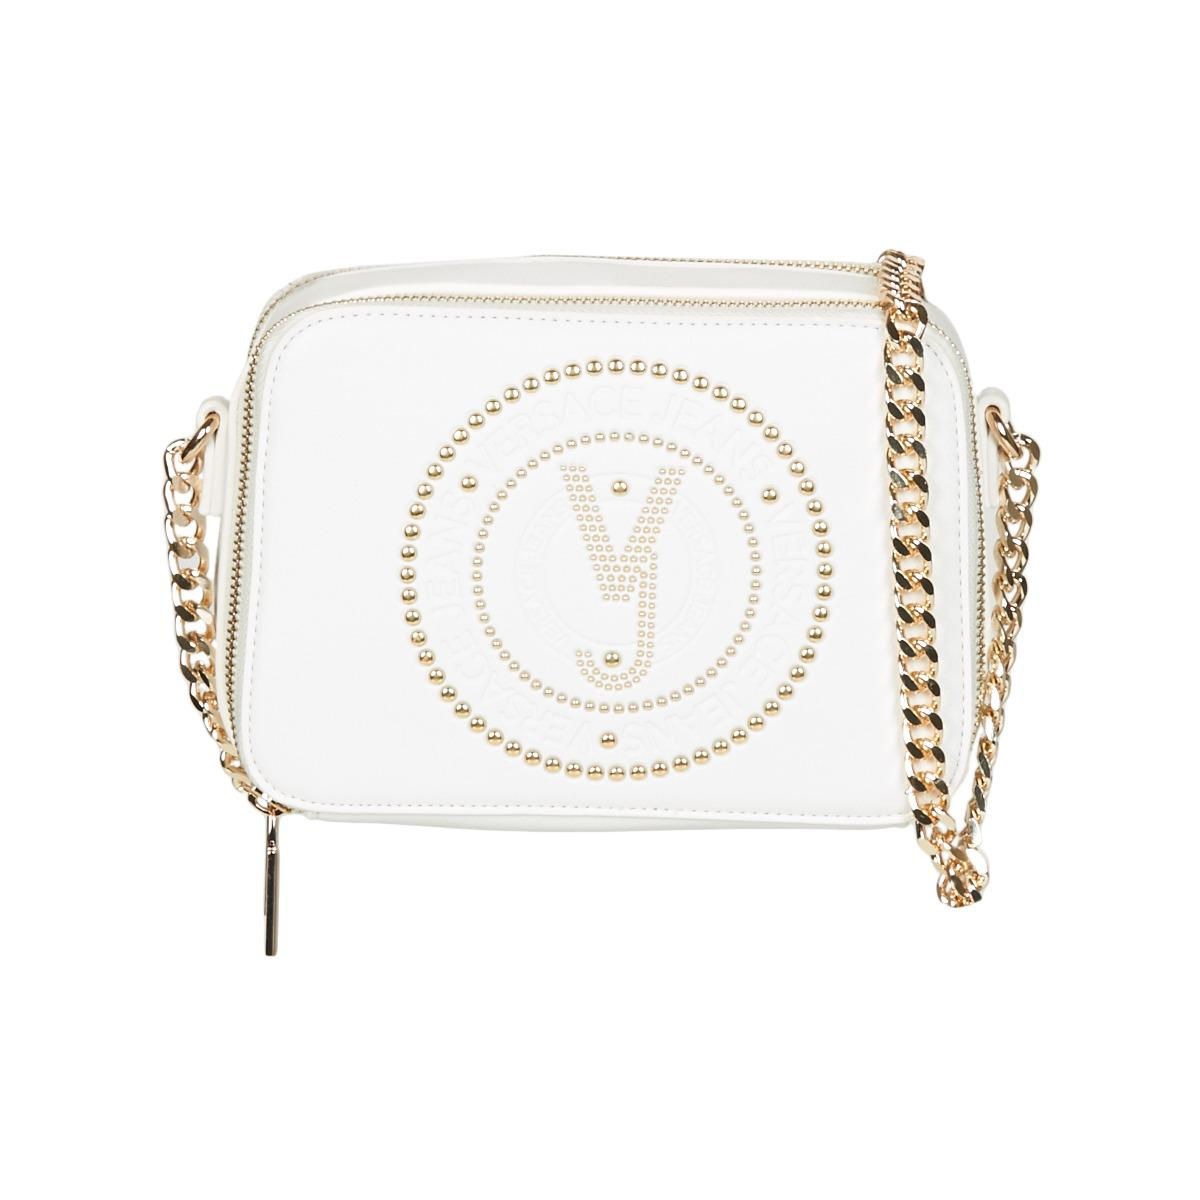 72cbbb9272 Versace Jeans E1vrbbqa Women's Shoulder Bag In White in White - Lyst